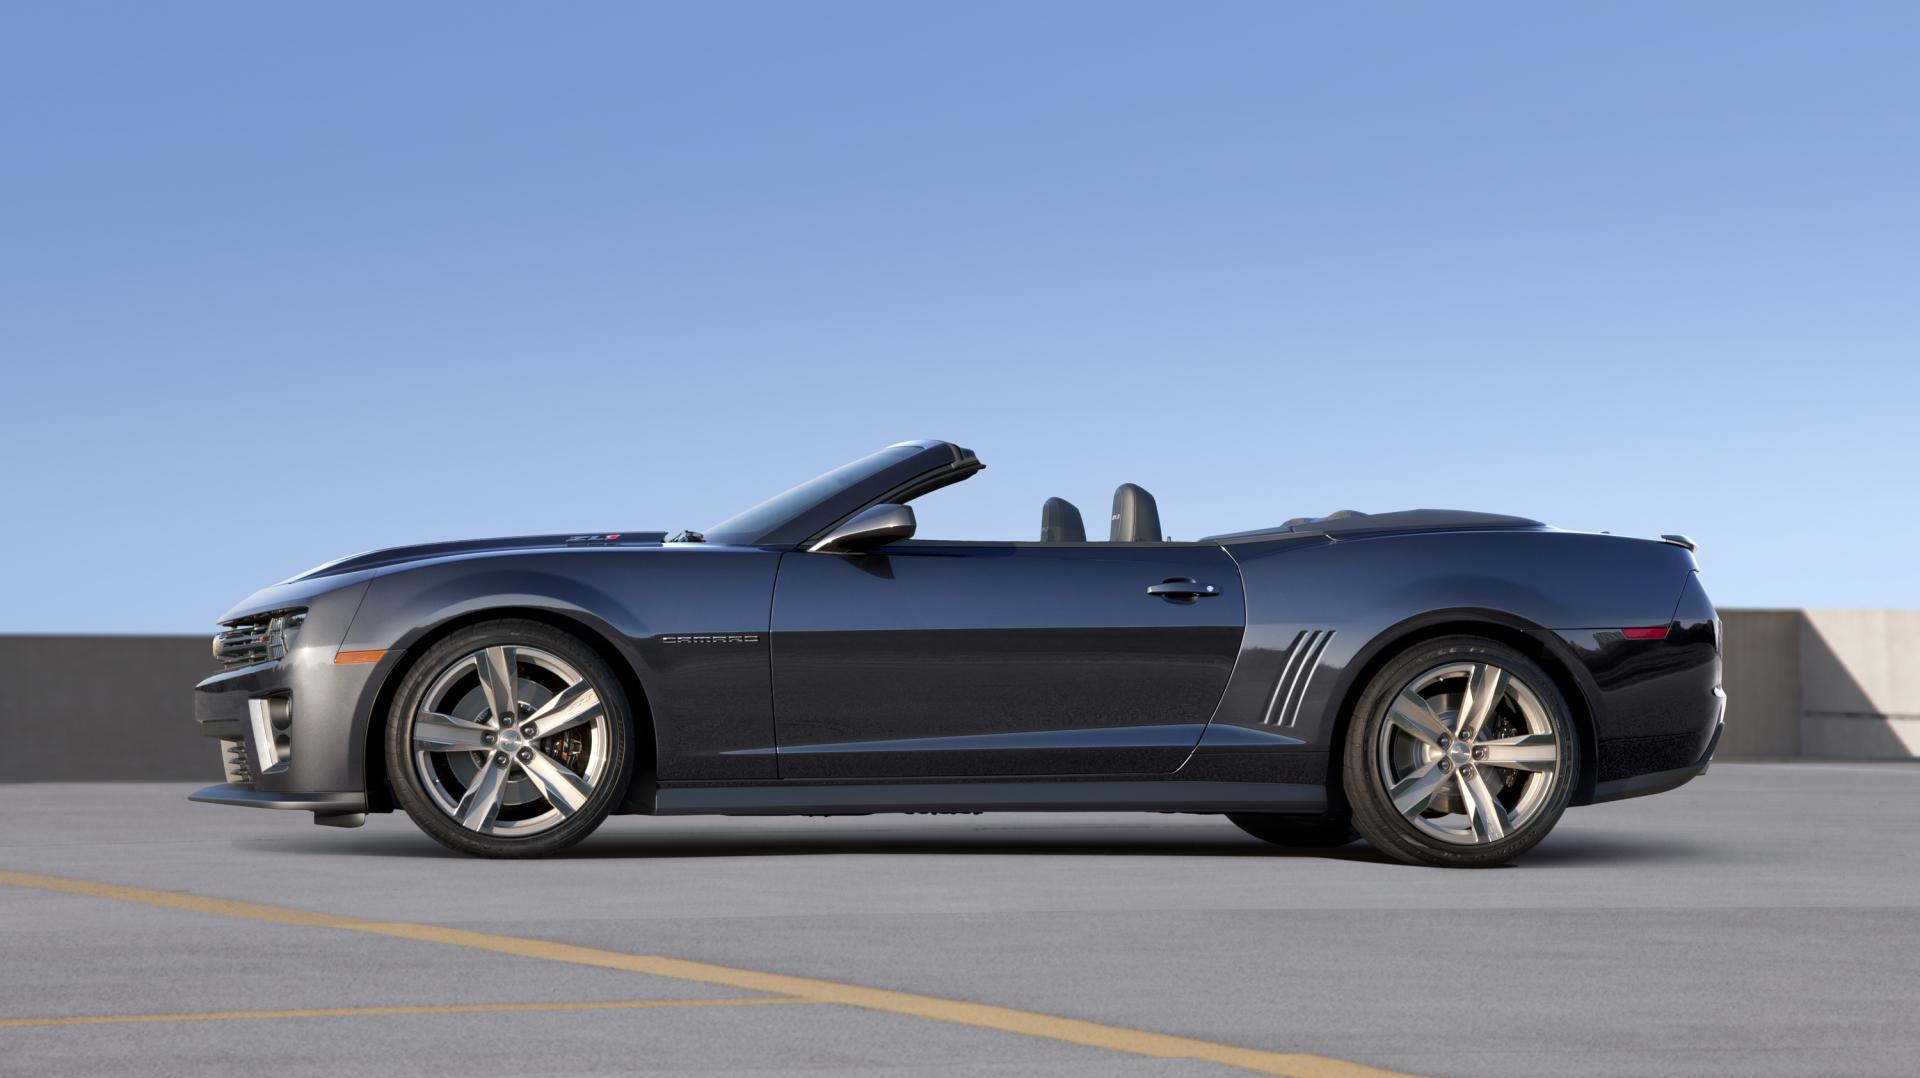 2013 Chevrolet Camaro Zl1 News And Information